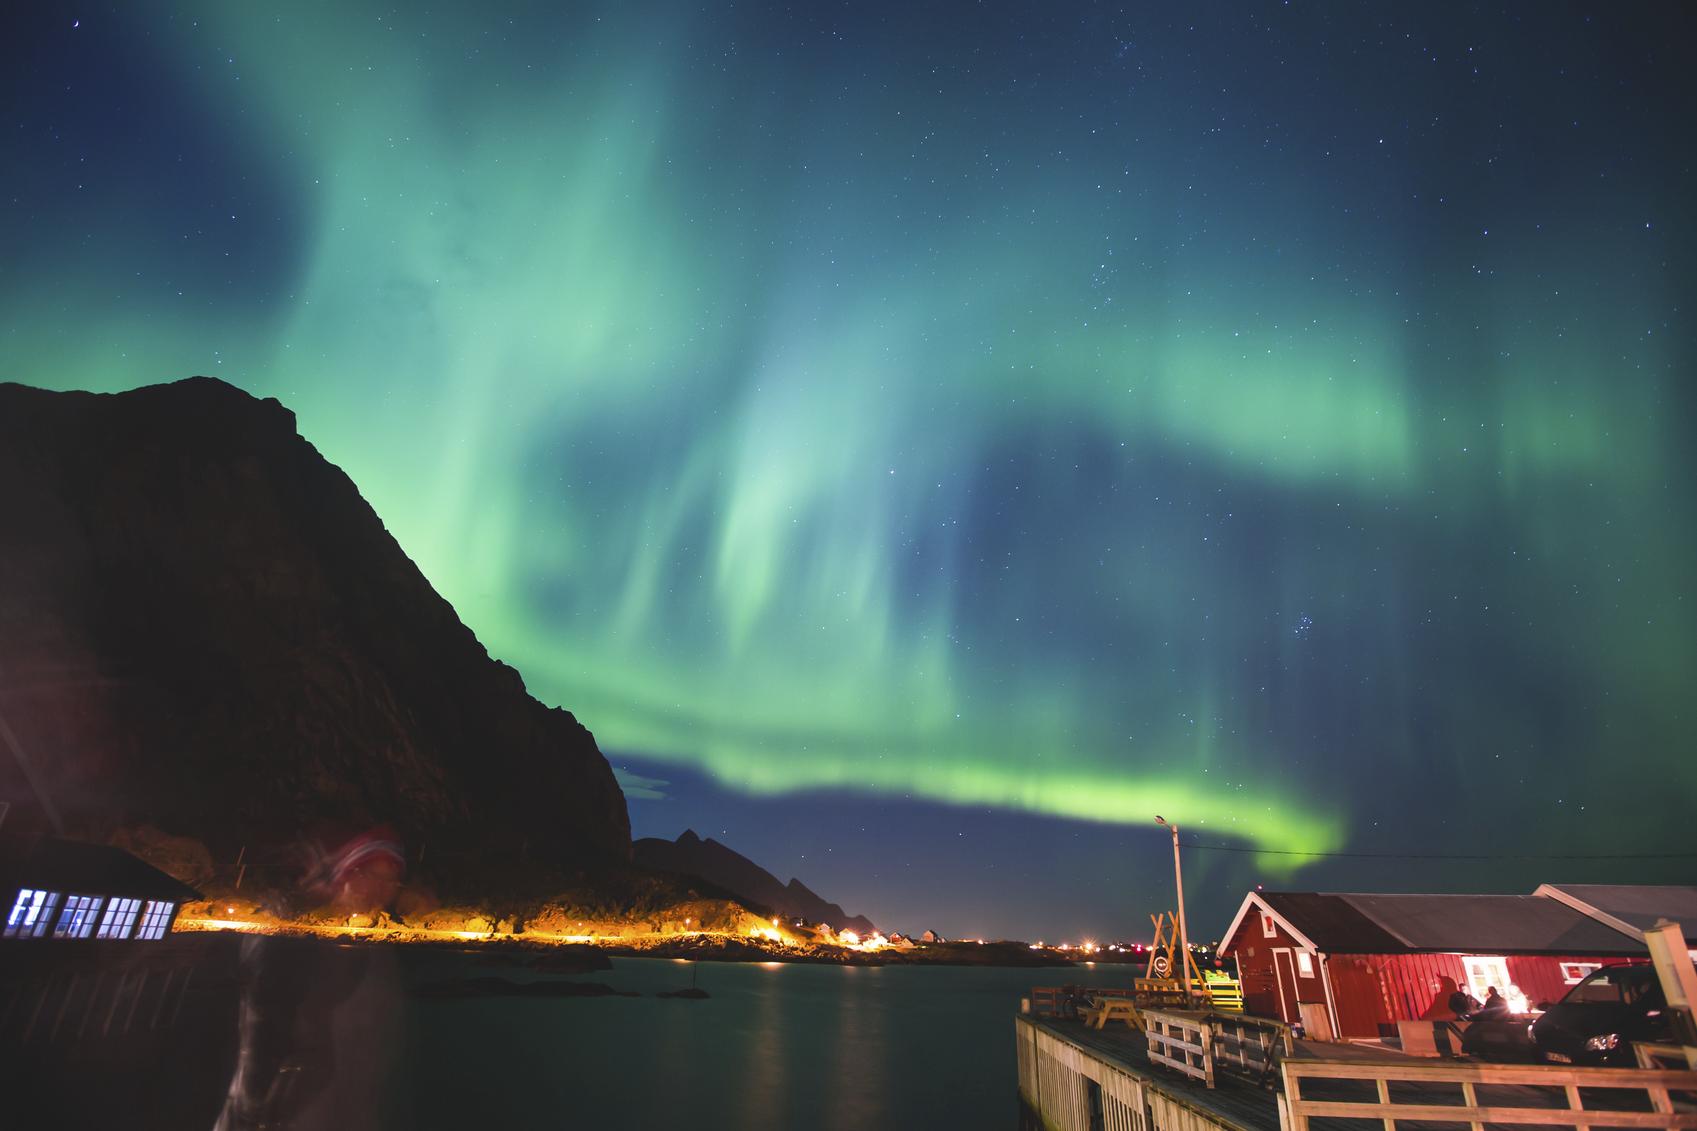 Beautiful picture of massive multicoloured vibrant Aurora Borealis, Aurora Polaris, Polar Light, also know as Northern Lights in the night sky over Norway, Lofoten Islands